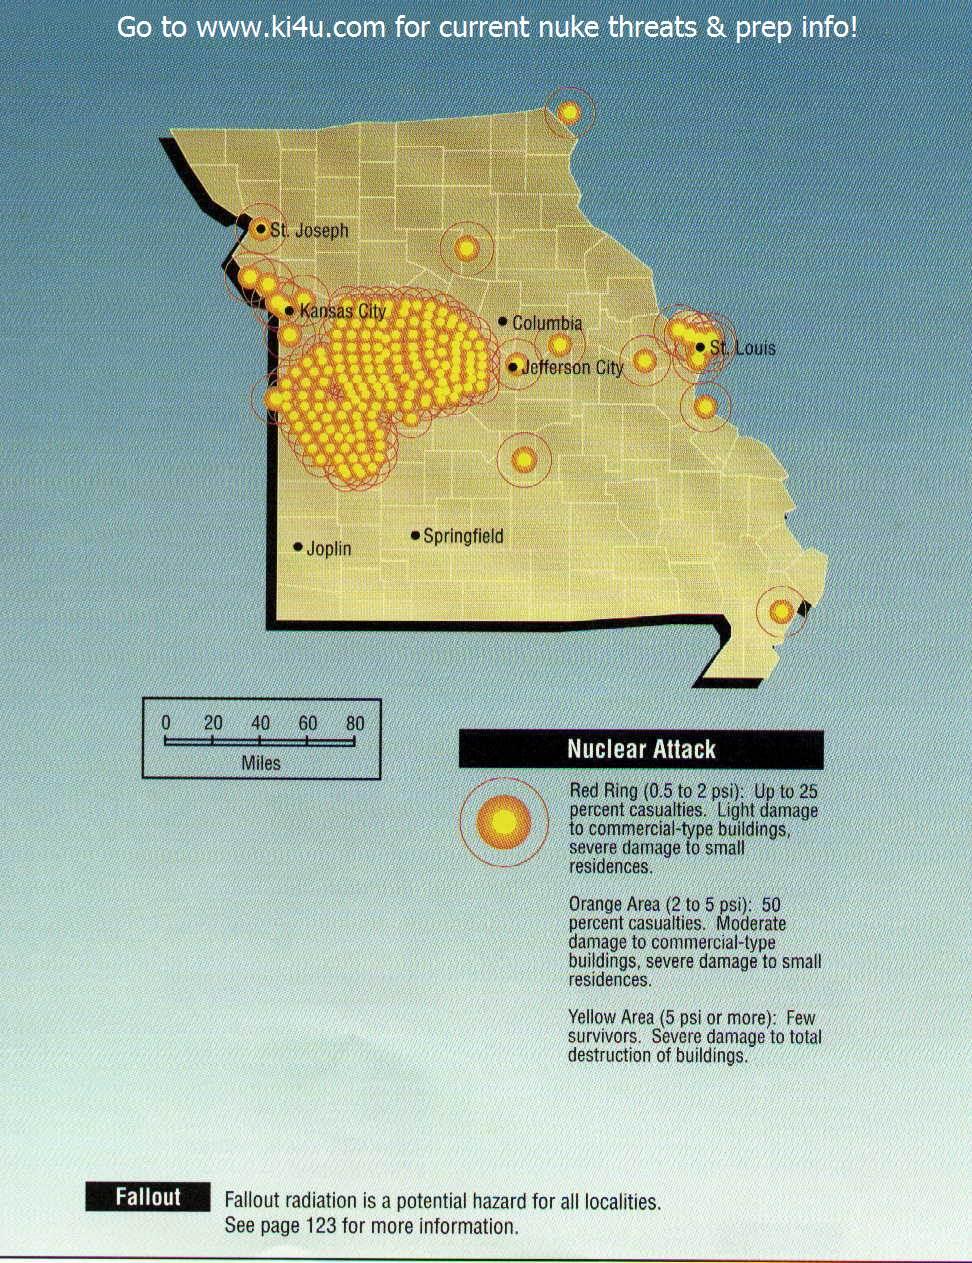 Nuclear Weapon Target Map For Missouri Fema 196 September 1990 Missouri Targets